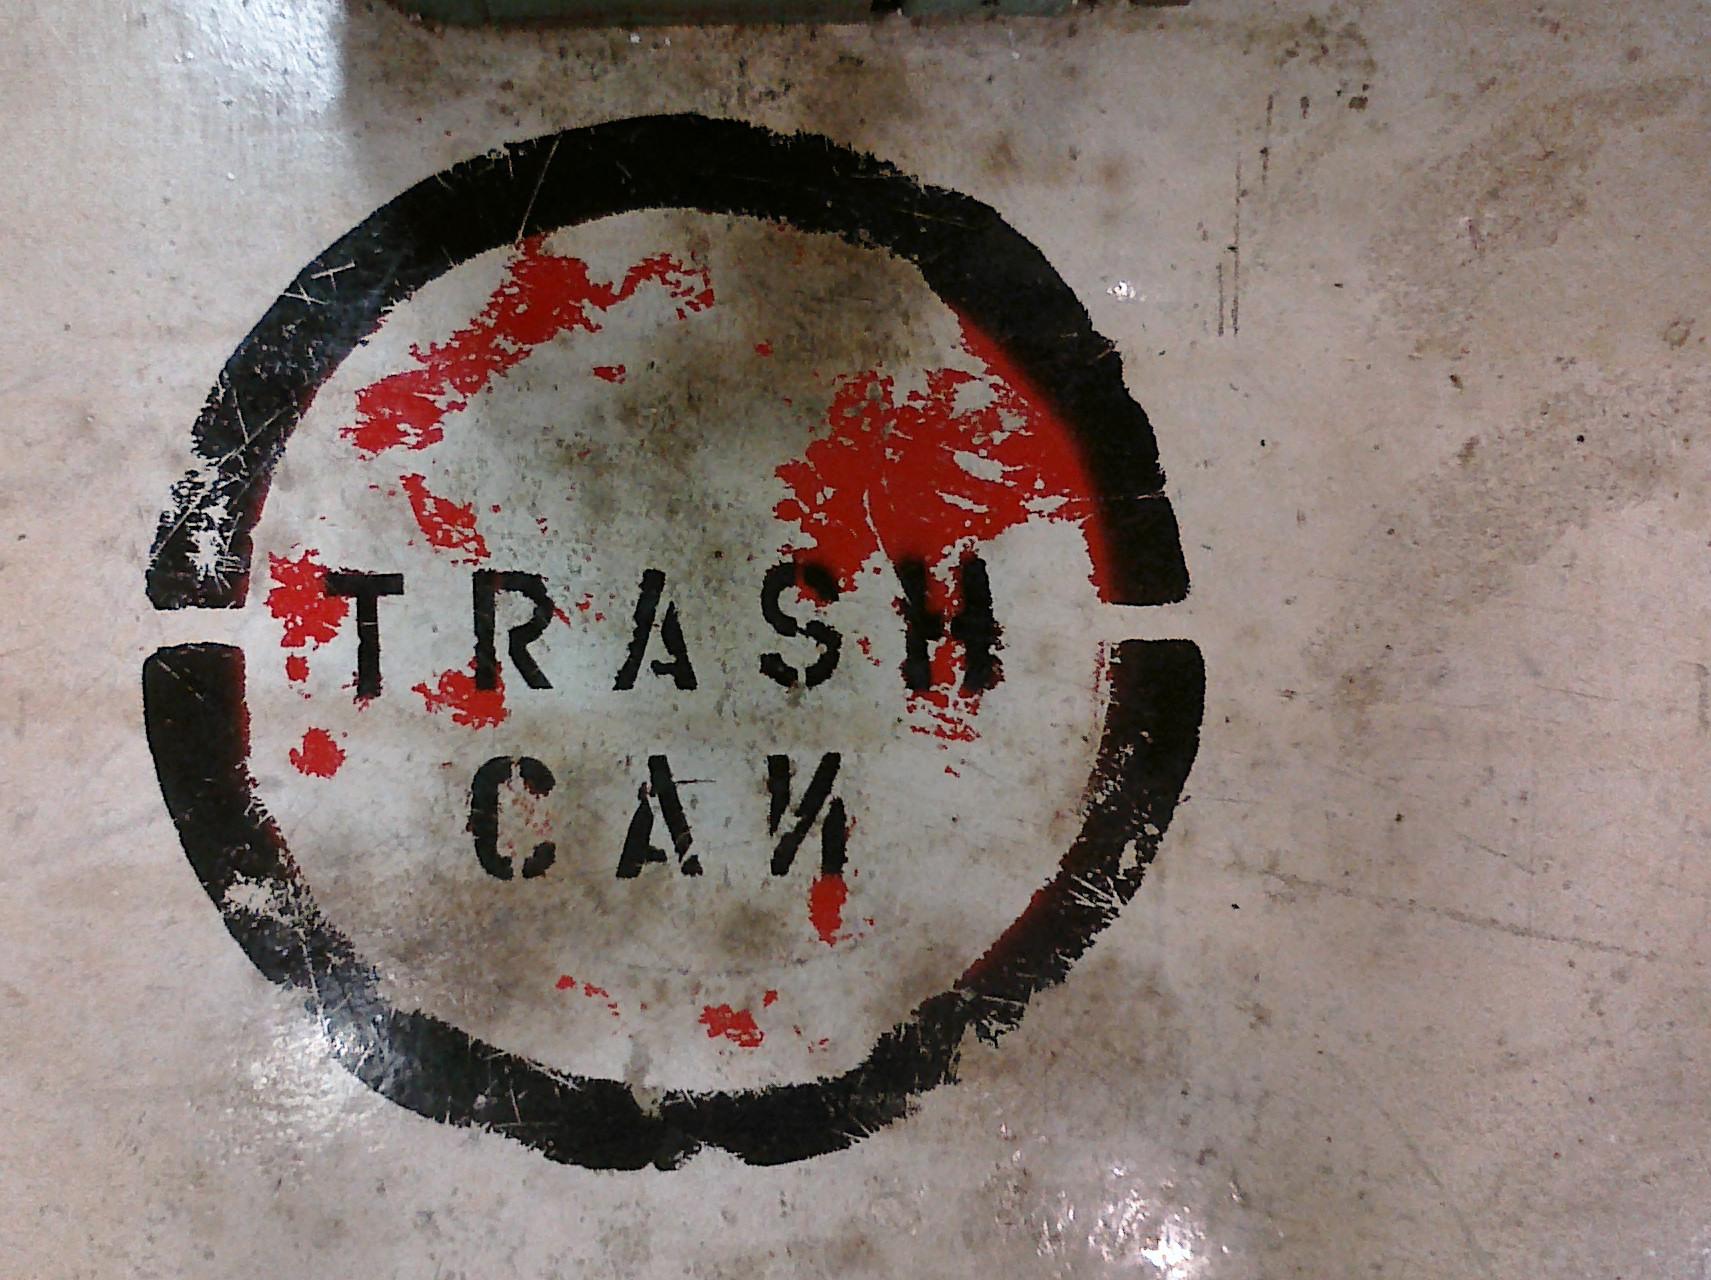 Trash Can. Autor: Paul Long. Izvor: https://www.flickr.com/photos/plong/4512860679/in/photolist-7SMAfK-c9pKQ7-soS2Z-4iPRv3-2ncNjE-714t9d-7GMJ6Q-6kBwYv-bD61Av-8hWvwV-7fquqf-5hyV7G-oUs2Hp-4zhem5-q1U59f-q21A6r-q1U4Zh-54xrYN-2zpts-itG7vx-ovfRF-8FRcpy-pnHqPi-7b18mU-fj7W8-af9g2F-4NYWEk-4P4cAN-5w6TdN-aaAeyV-q21zNn-dxUVdB-4tST9Q-hManA-6PBKiz-5keWm3-vGohoJ-hQJNZz-7oR5A-afcahL-4LiHRw-4QmpW7-dLfwAg-8fRuPv-636RaR-4aQy8J-dRHY1j-7KQX1X-4iXgSq-dBTfhJ